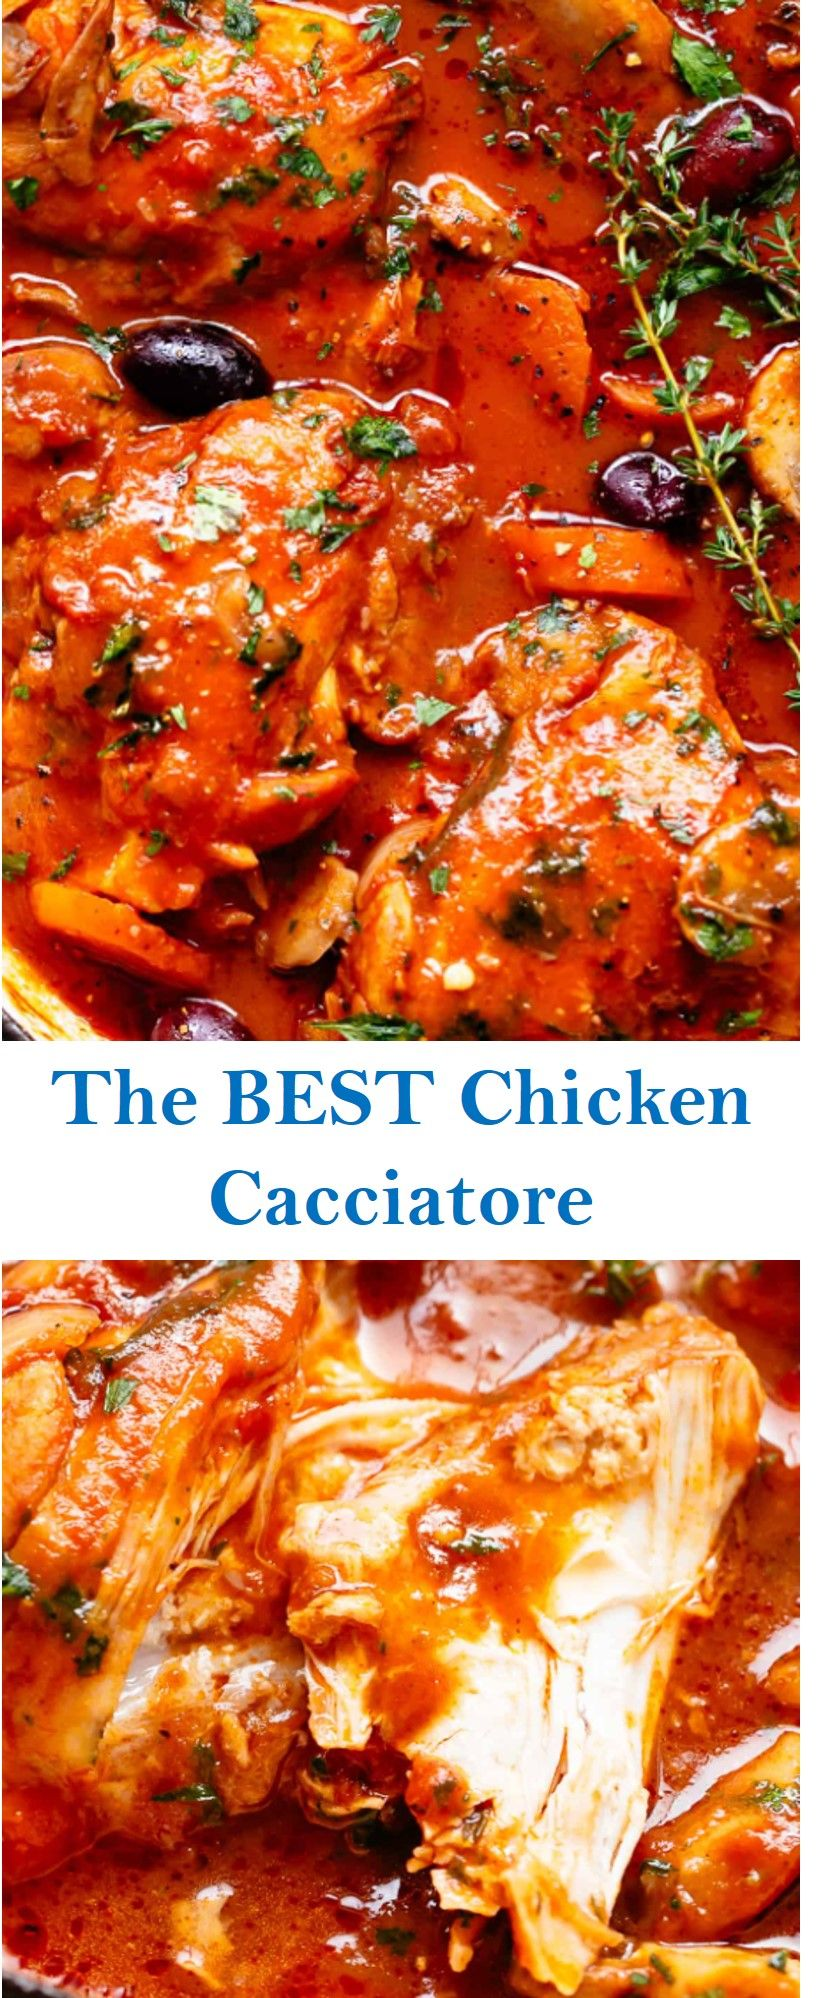 The Best Chicken Cacciatore Cacciatore Recipes Chicken Cacciatore Recipe Chicken Cacciatore